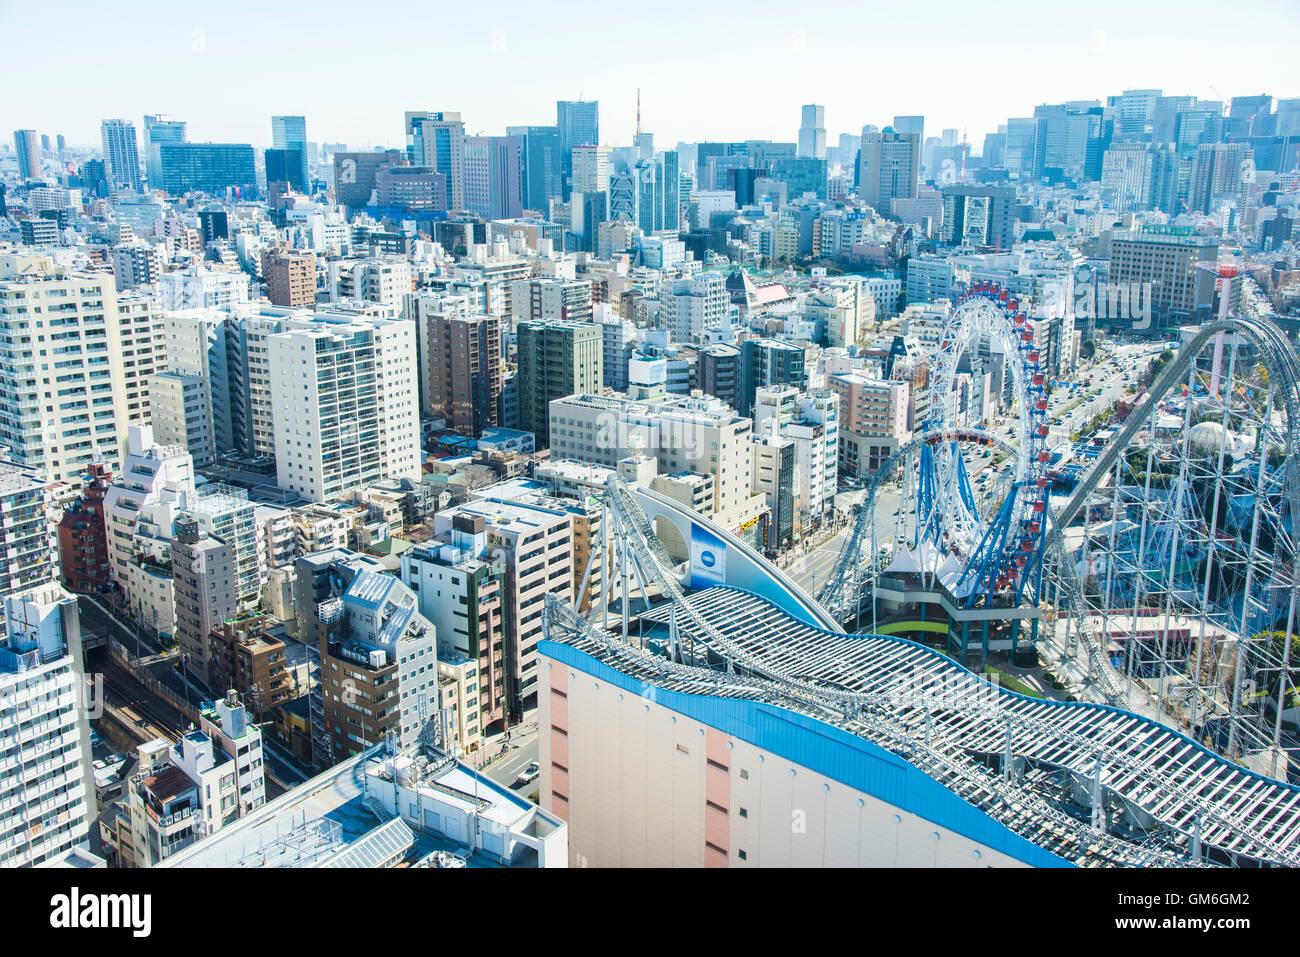 Tokyo Dome City Attractions , Bunkyo-Ku, Tokyo, Japan - Stock Image